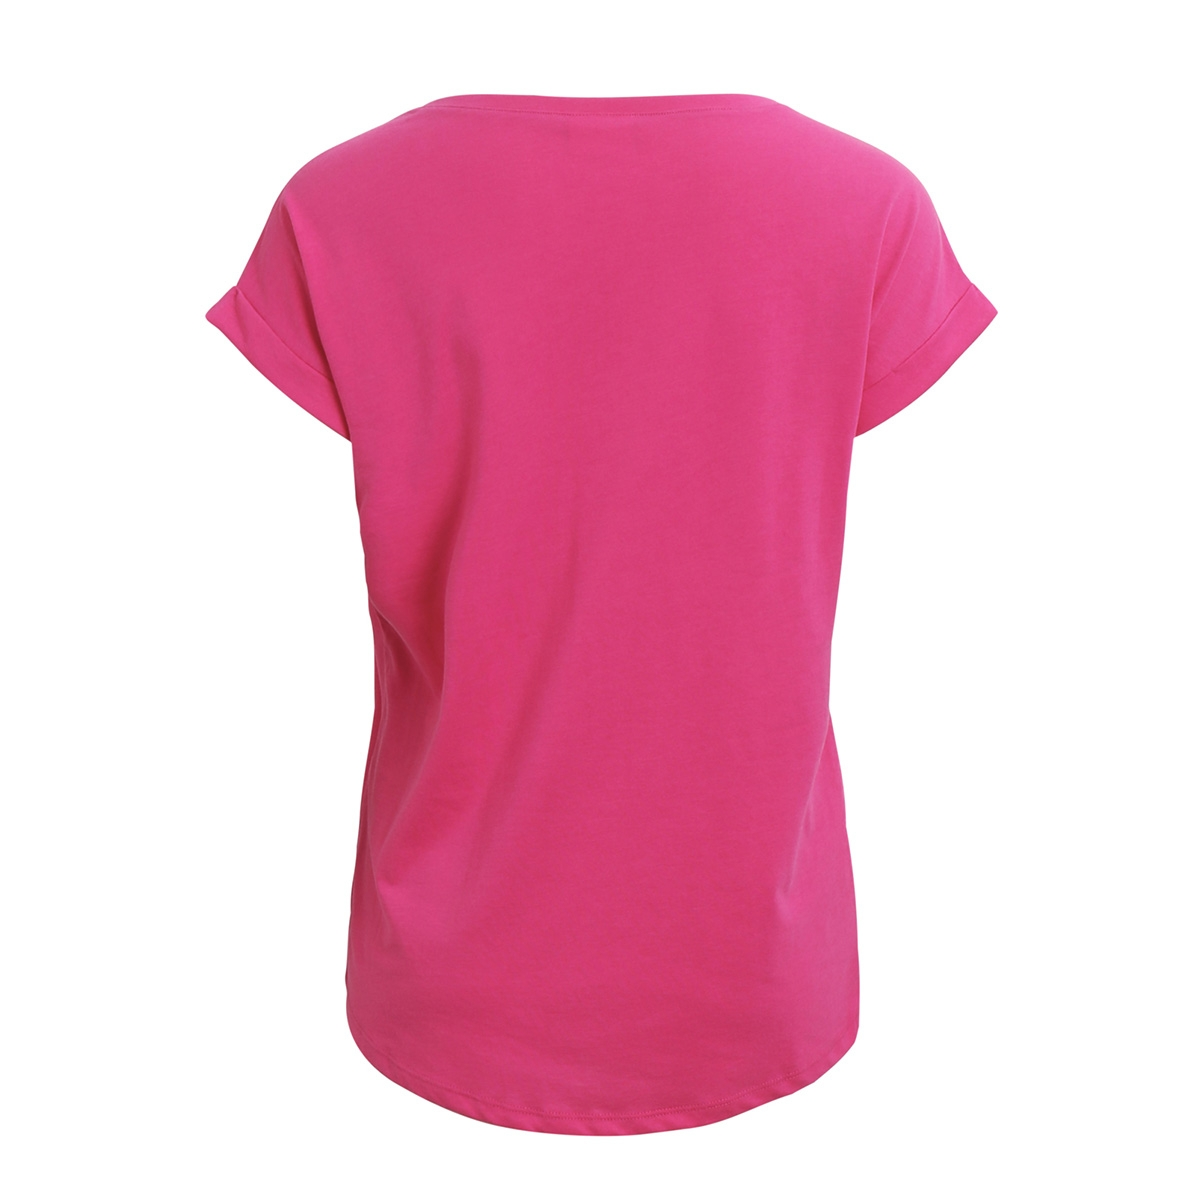 vidreamers pure t-shirt-fav 14043506 vila t-shirt beetroot purple